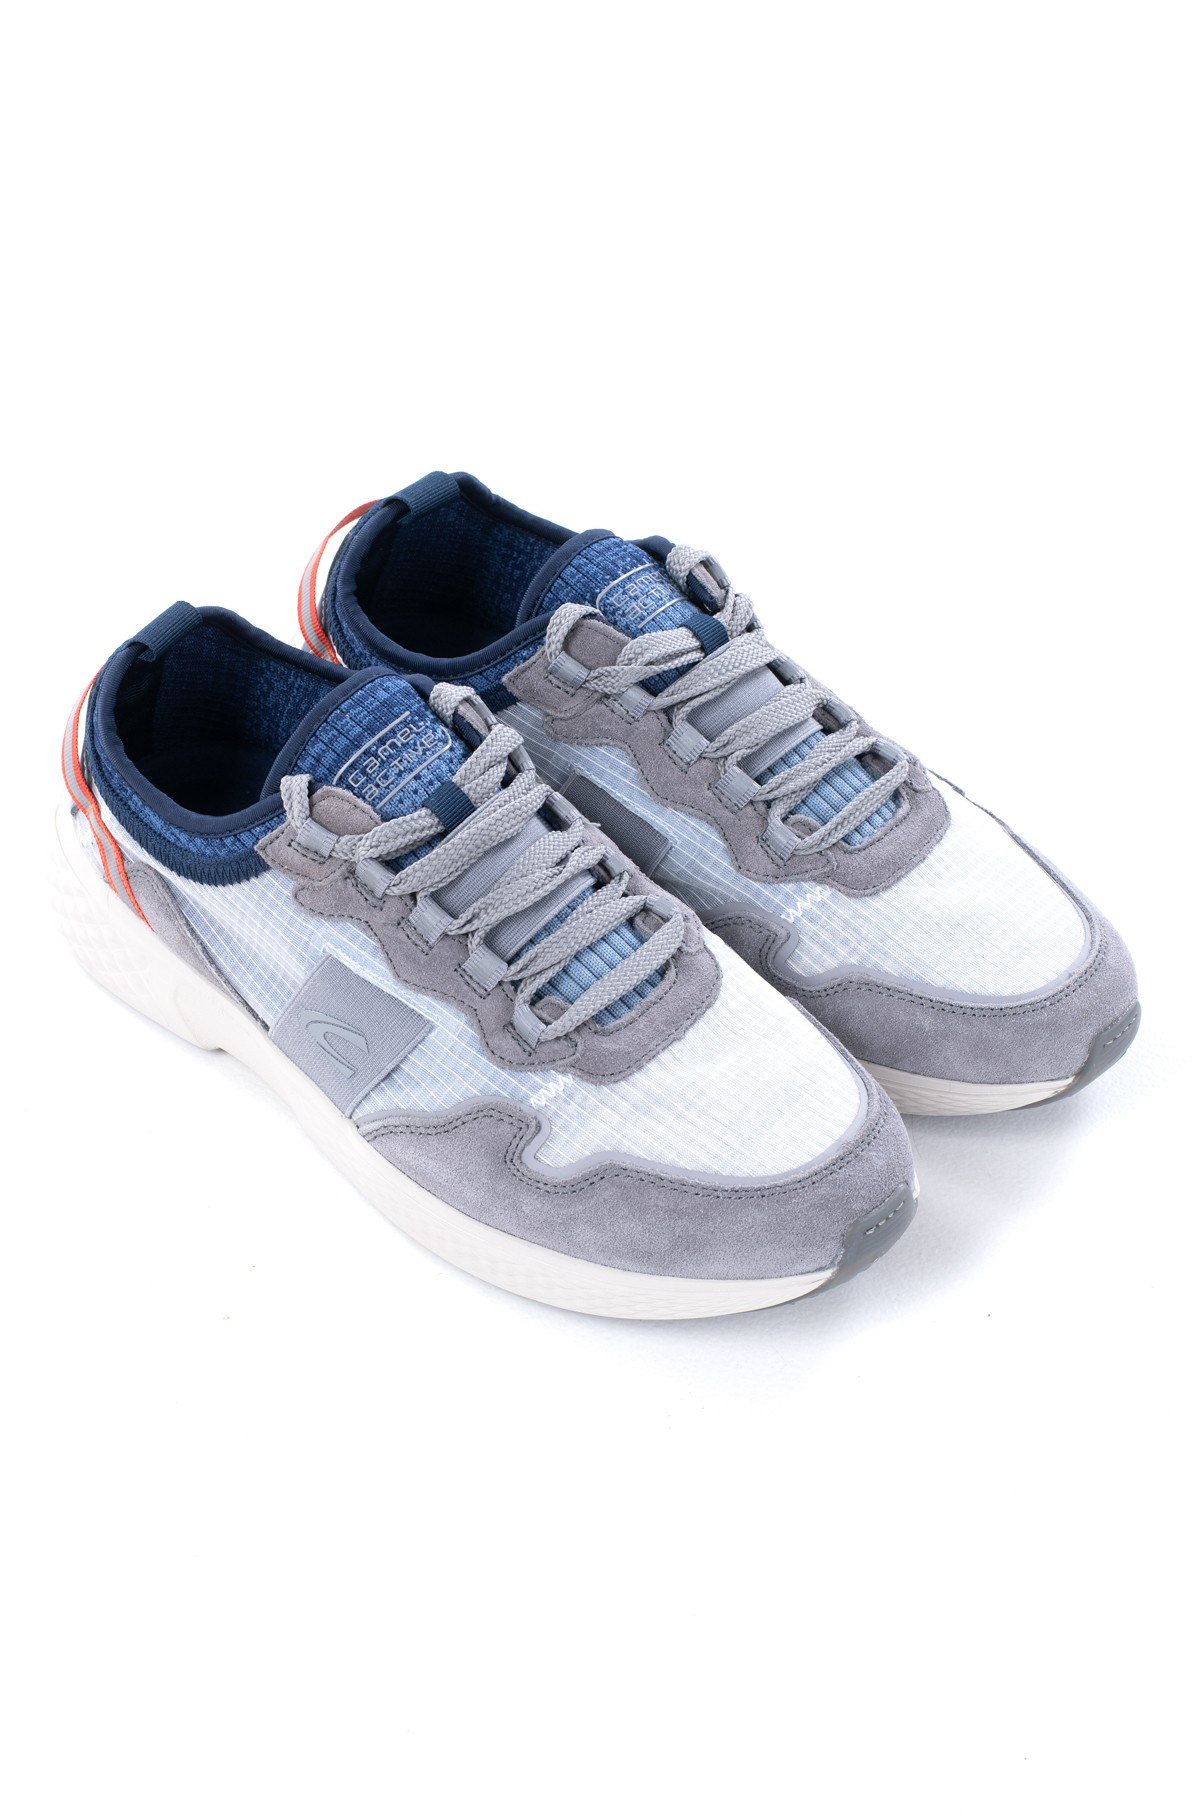 Footwear 22238807-full-1